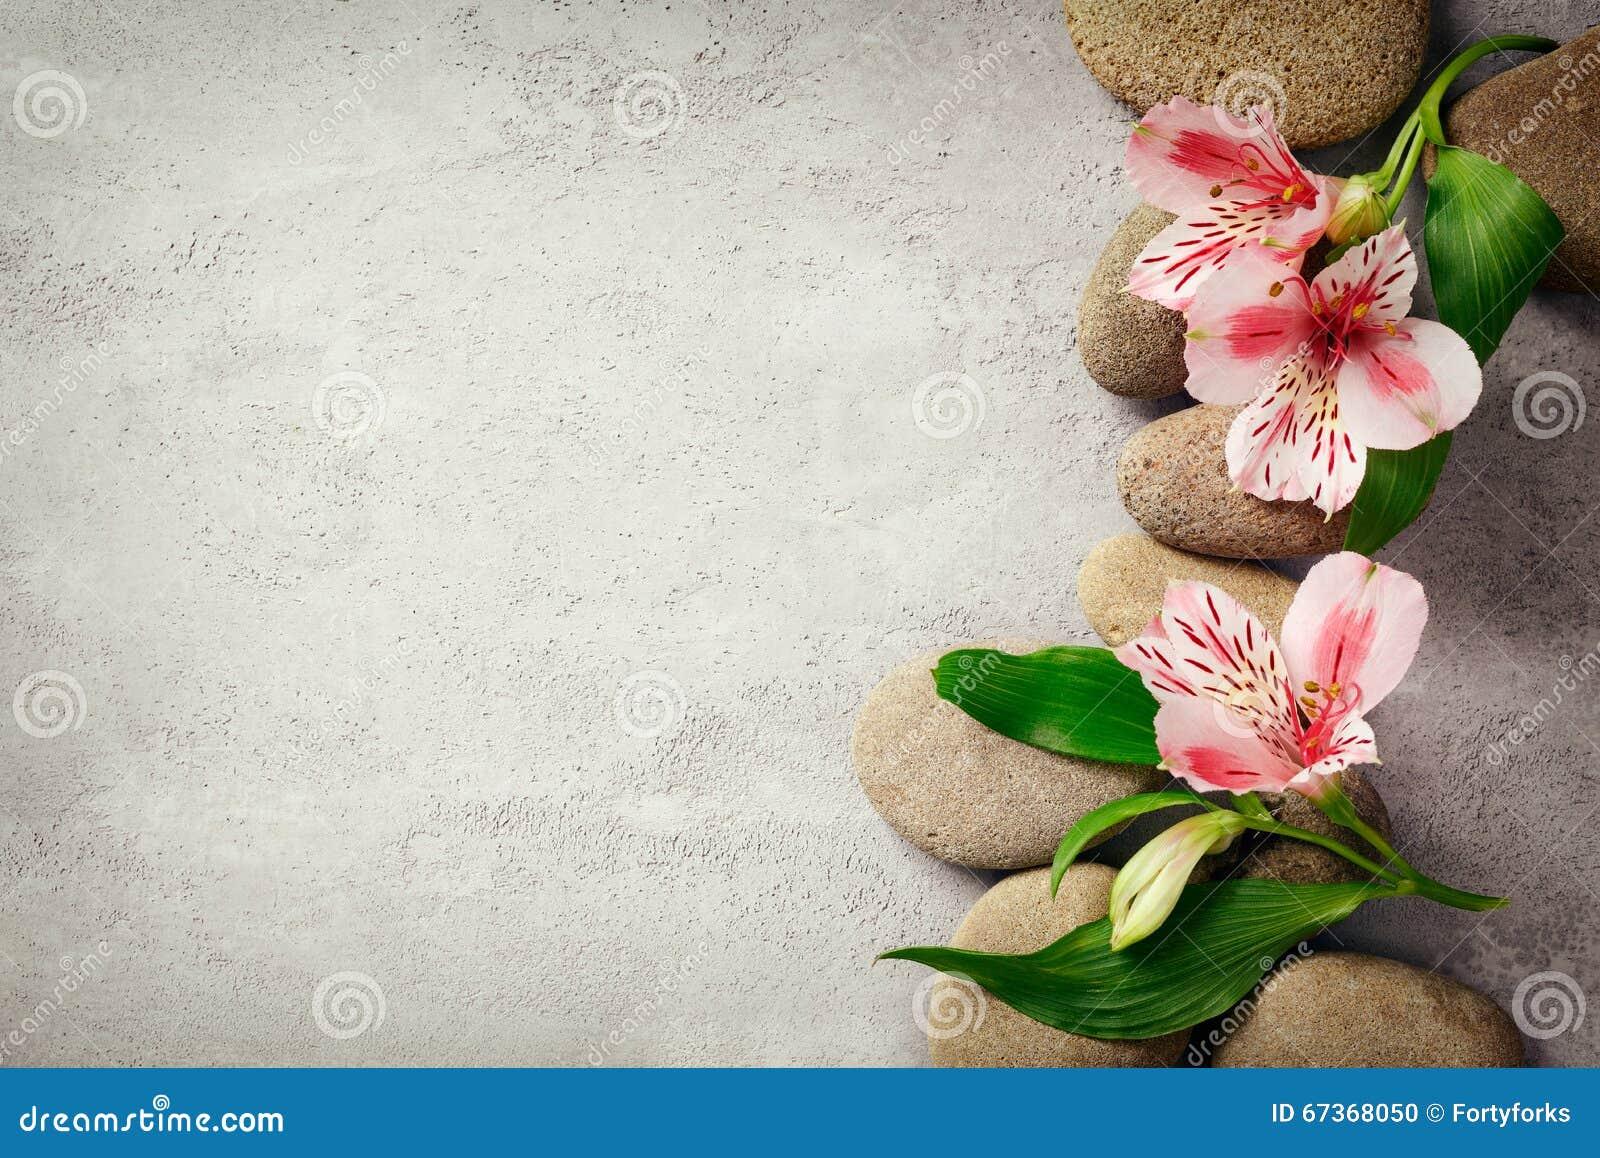 Frangipani spa flowers stock photo image 14654190 - Spa Background With Flowers Stock